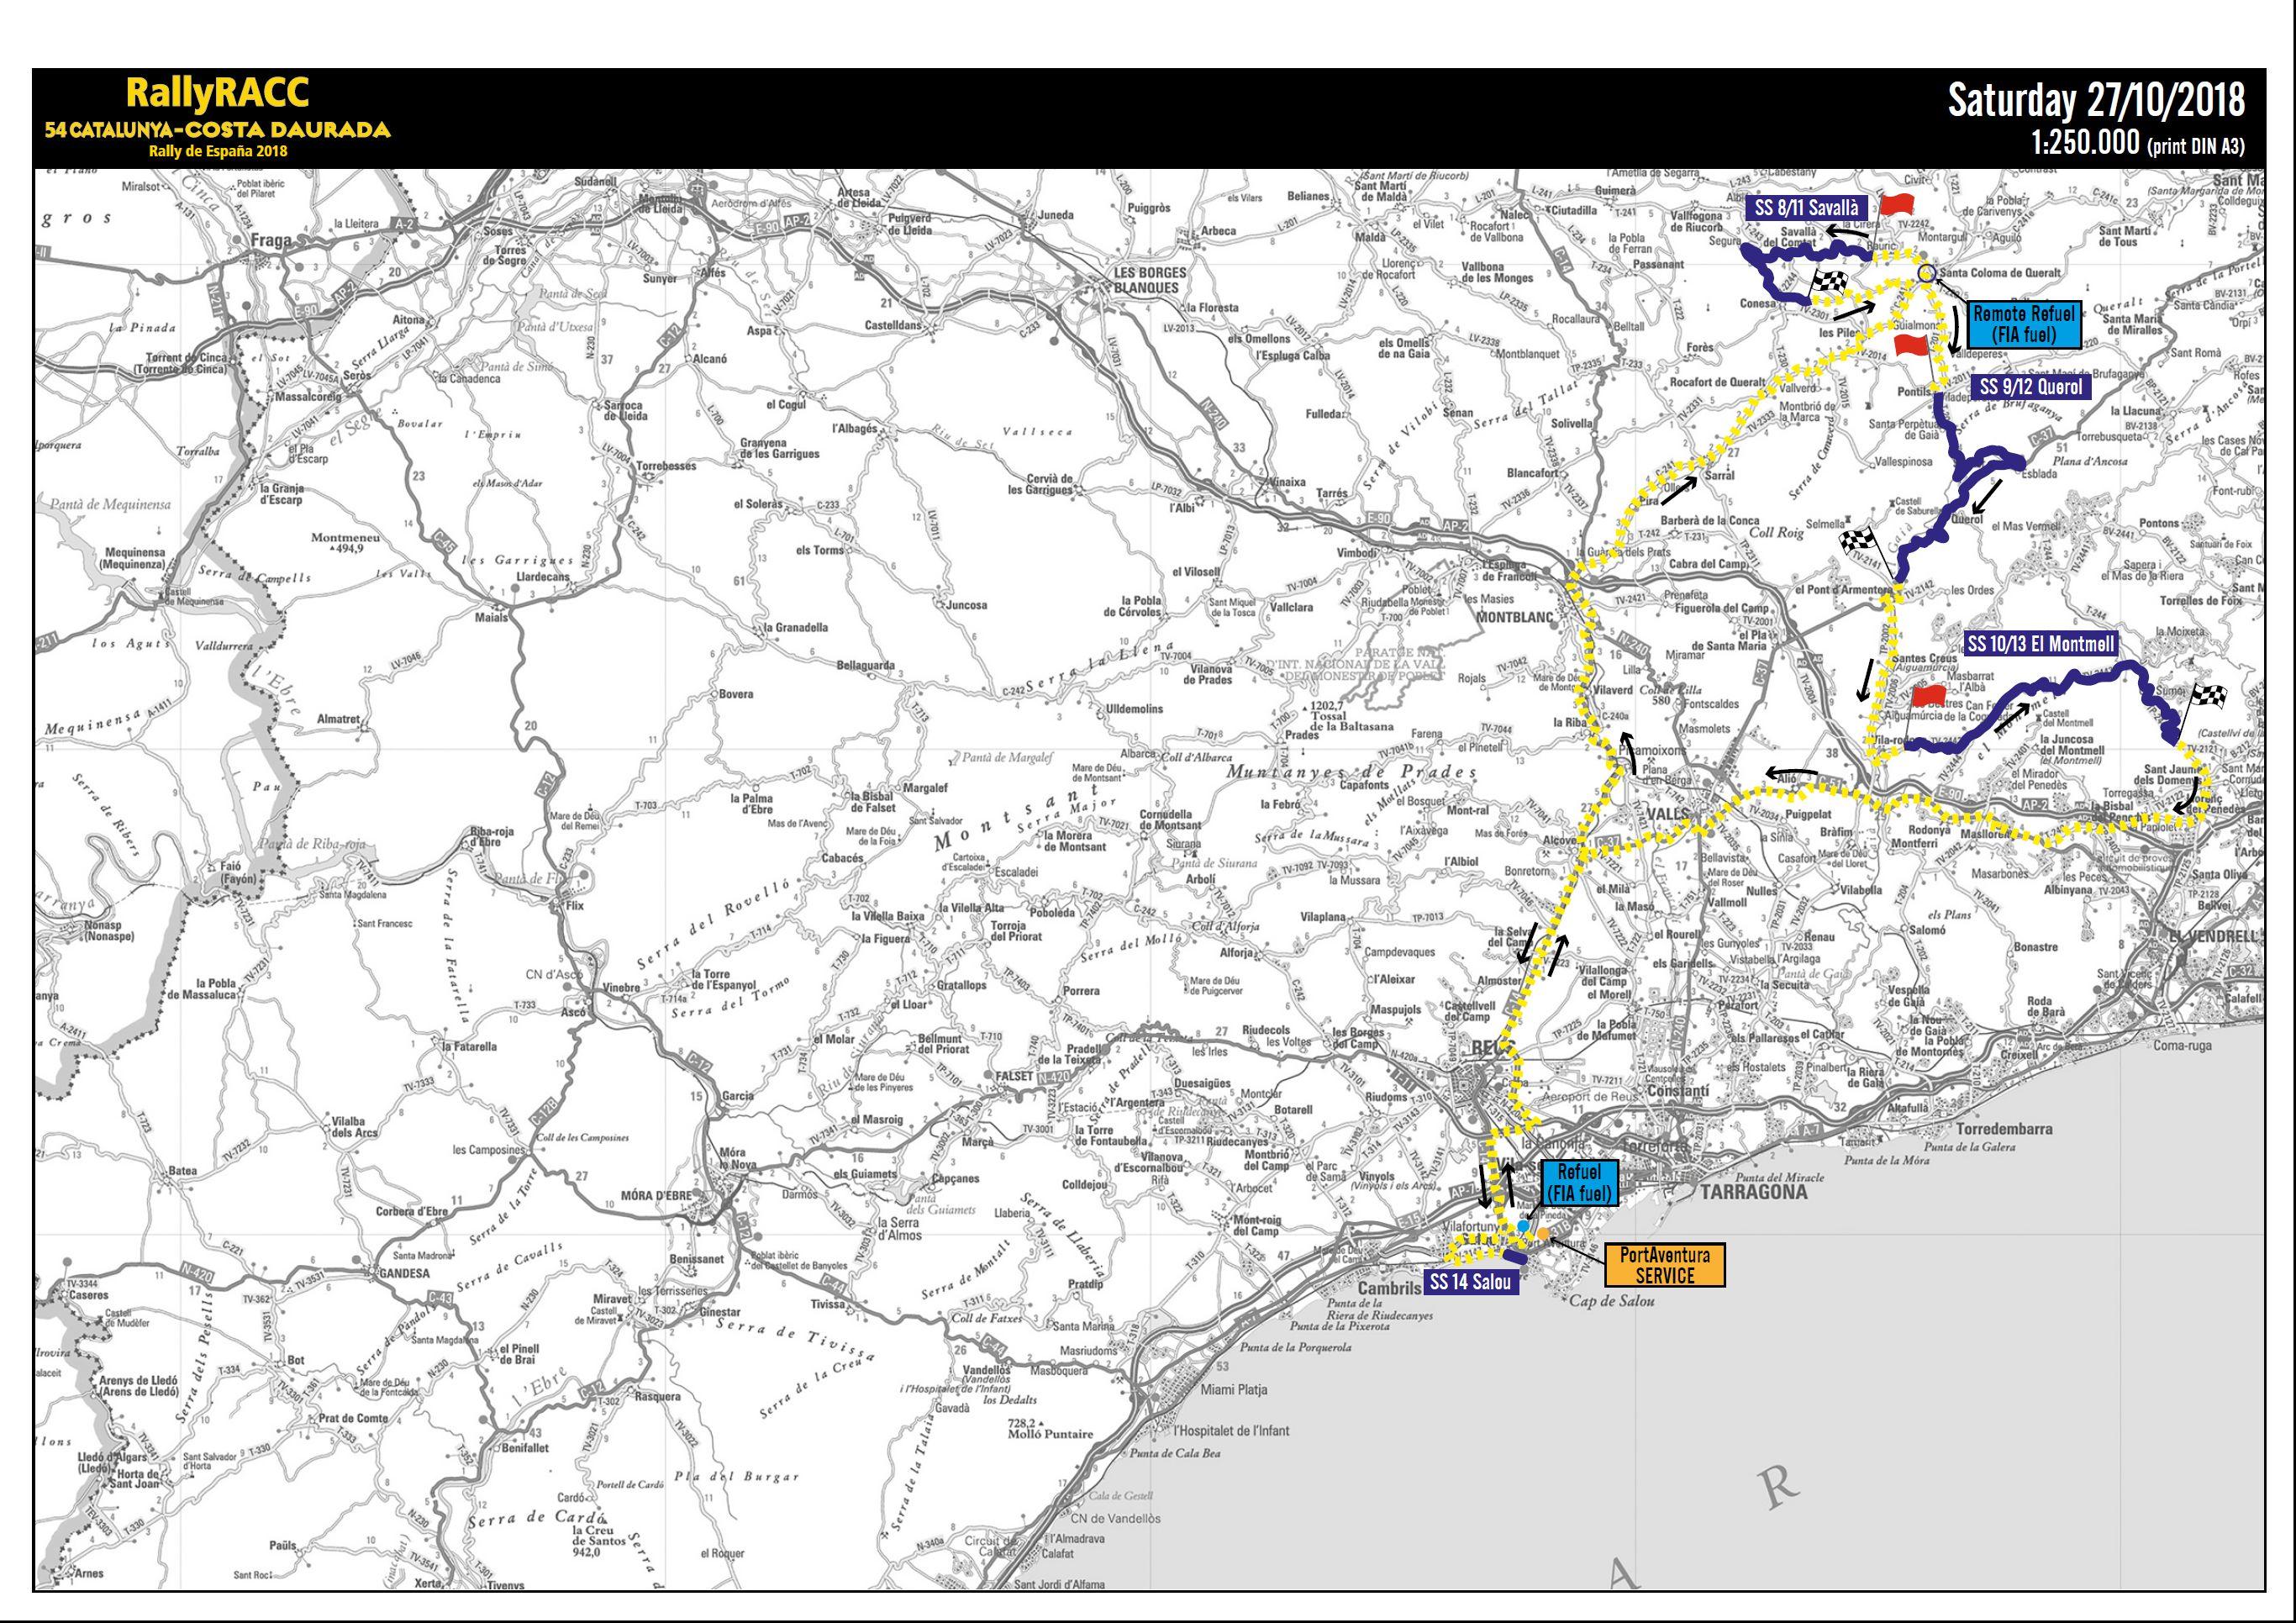 RallyRACC Catalunya - Costa Daurada 2018 Post-330-0-66693700-1536483461